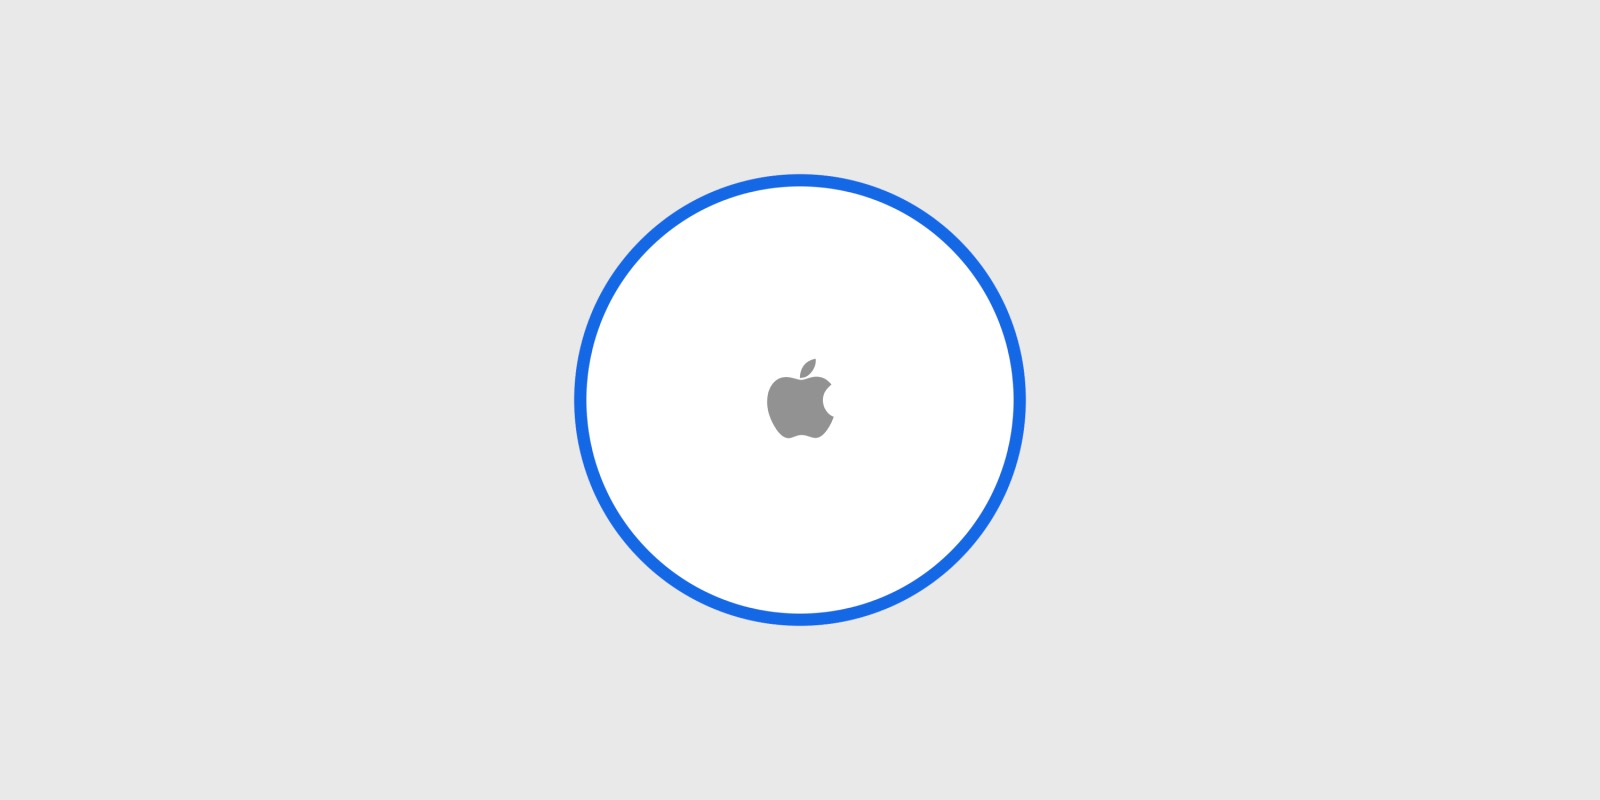 Apple、高精度な紛失防止タグ「AirTag」の発売は4月以降に?